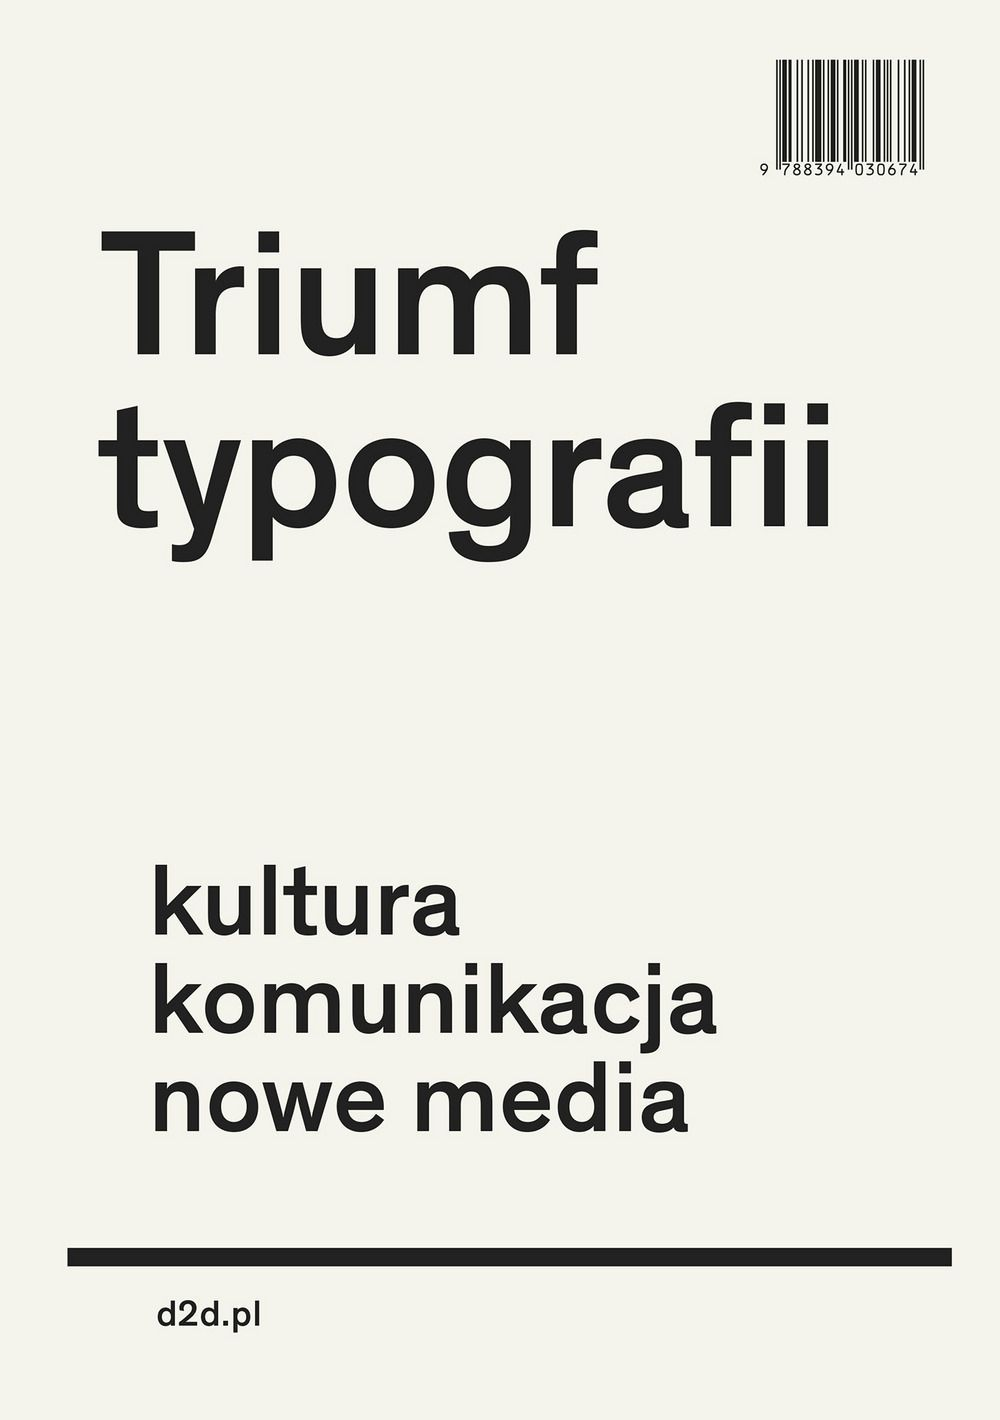 Hoeks Henk, Lentjes Ewan, Triumf typografii. Kultura, komunikacja, nowe miedia